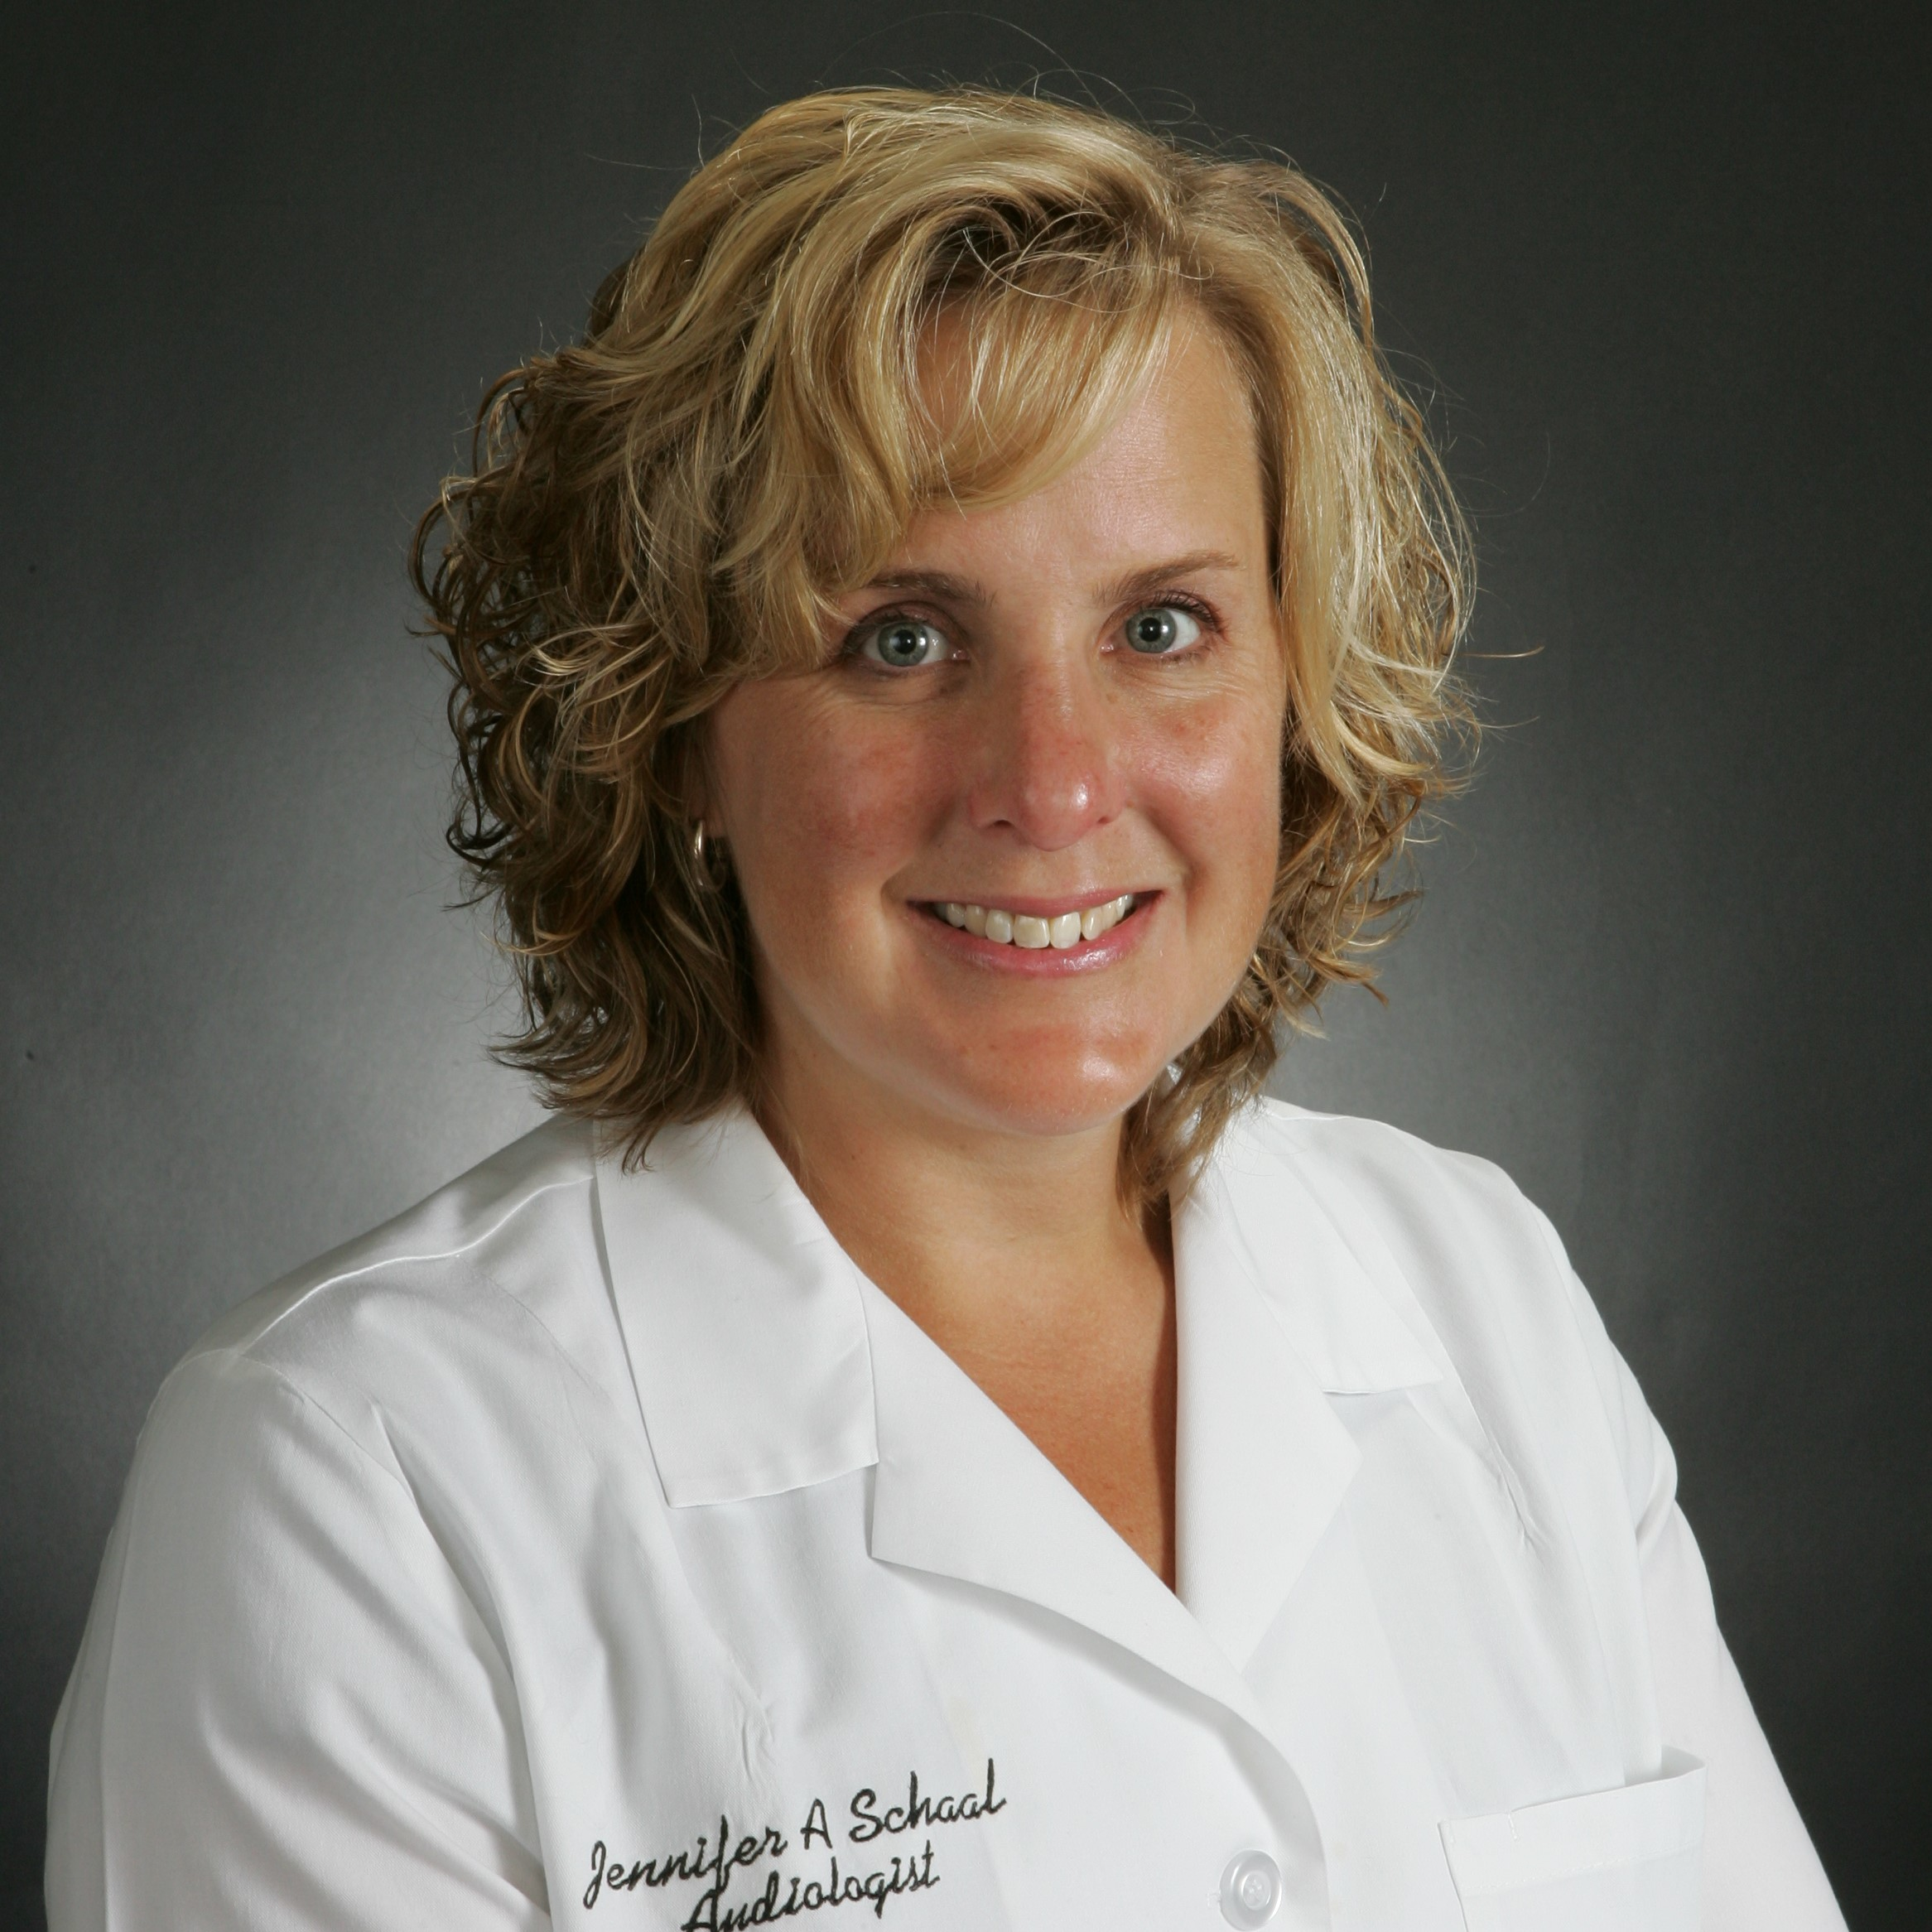 Jennifer Schaal-Sampson, AuD